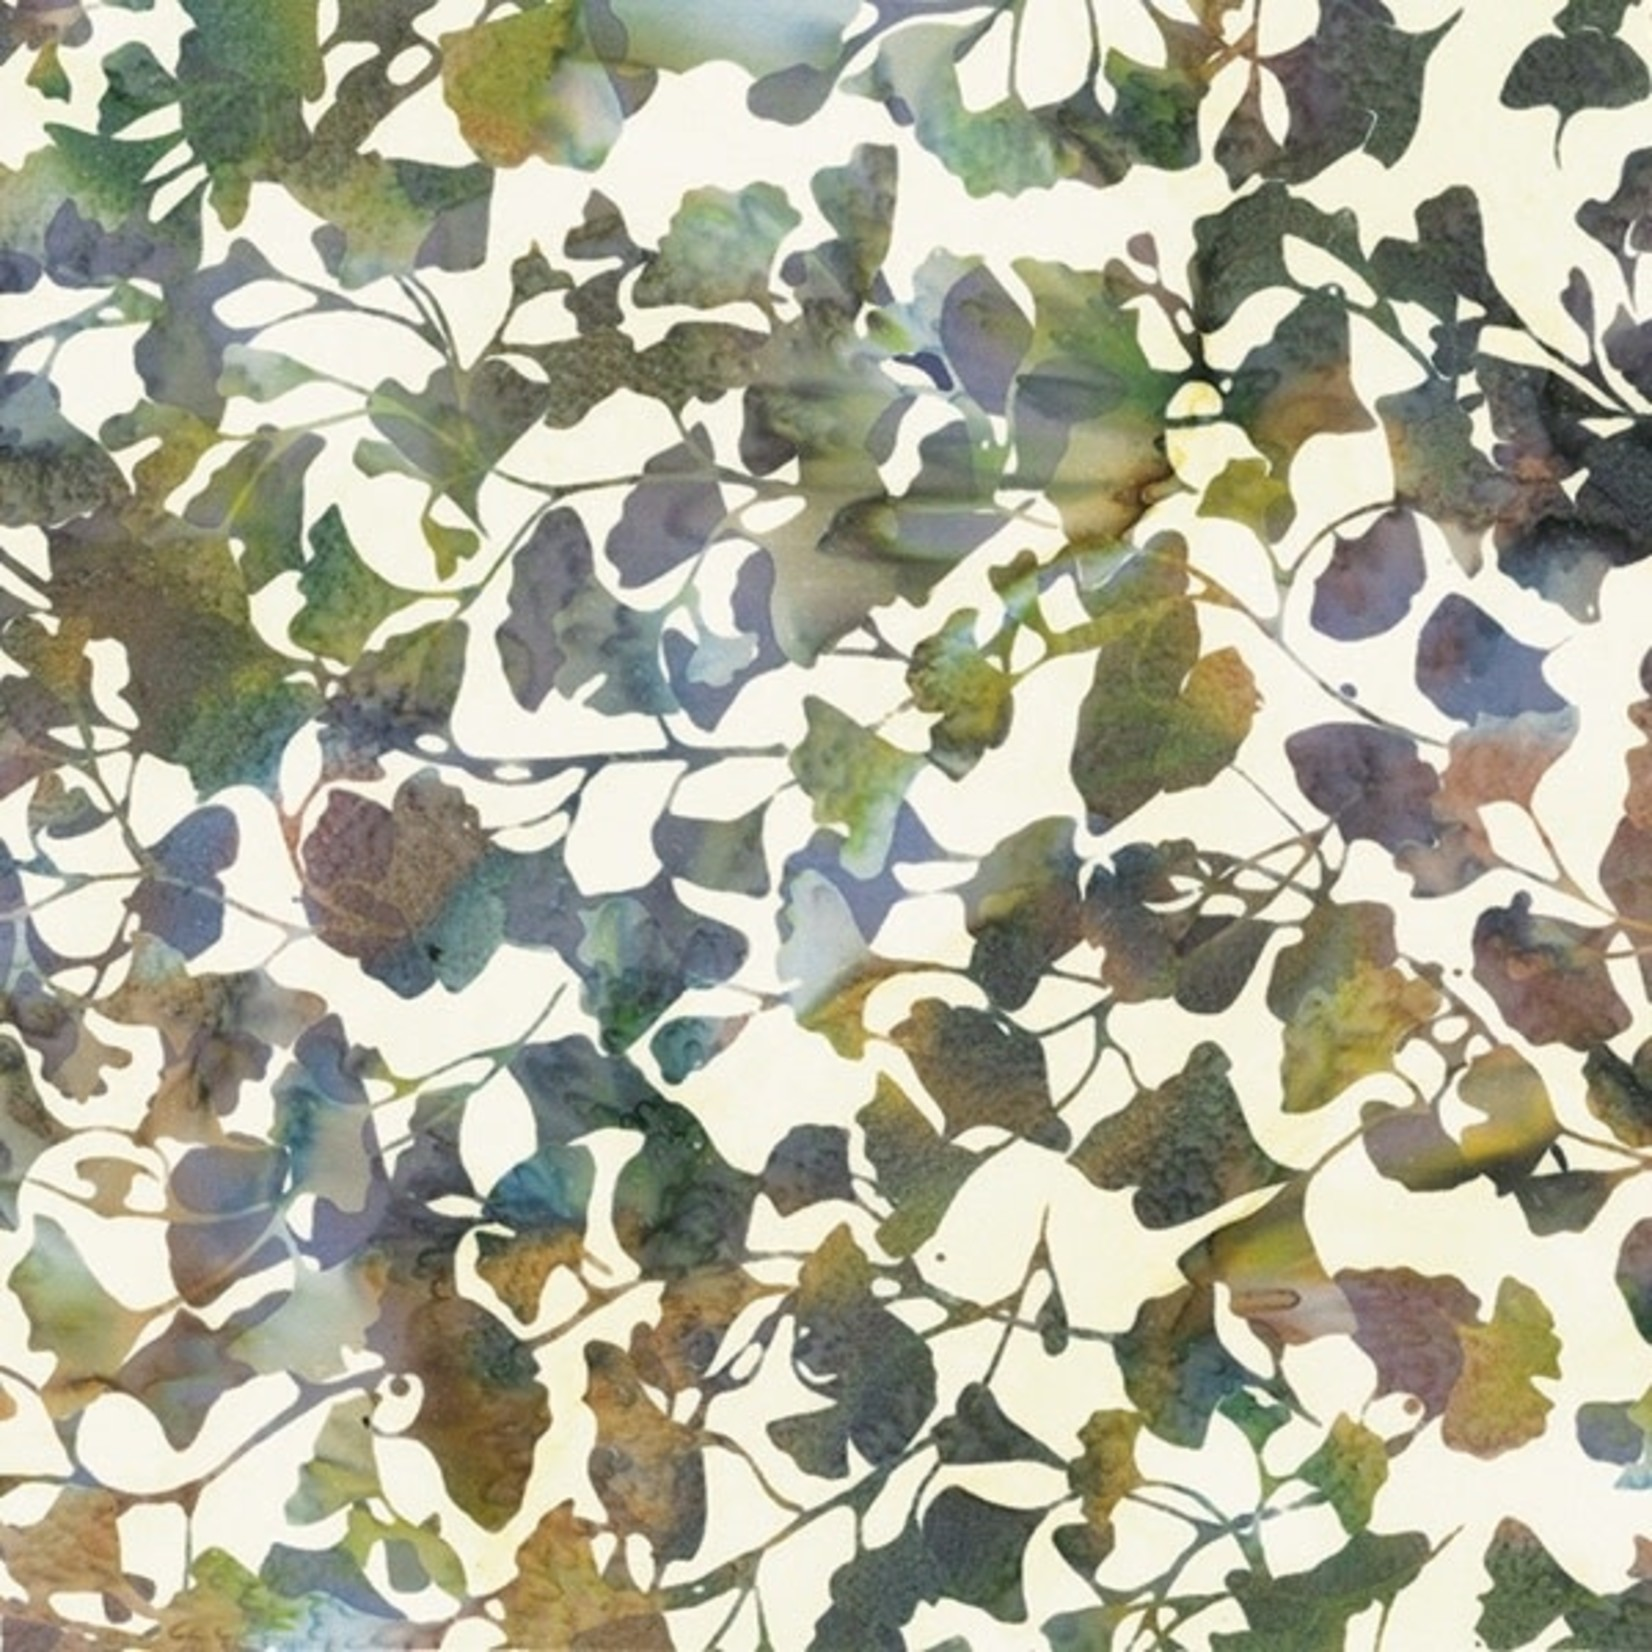 Hoffman Bali Batiks, Leaves, Vineyard 2376-545 $0.20 per cm or $20/m